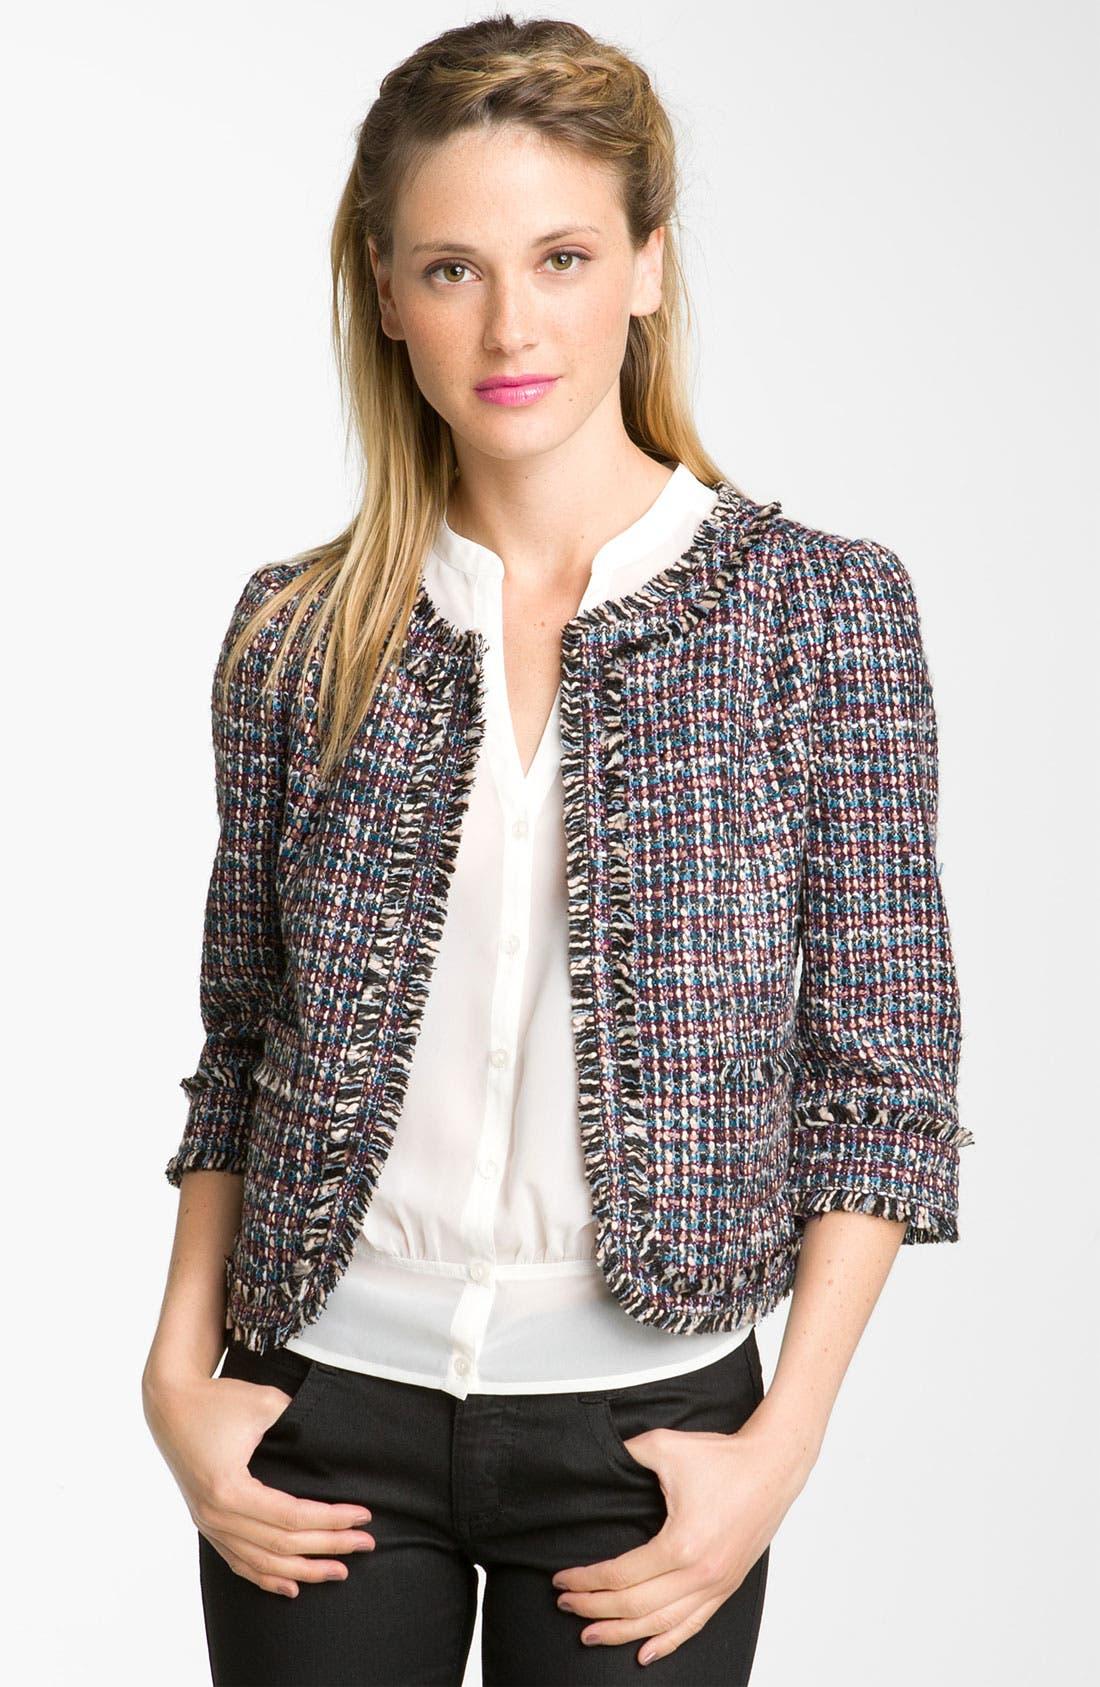 Alternate Image 1 Selected - Frenchi® 'Vanity' Tweed Jacket (Juniors)